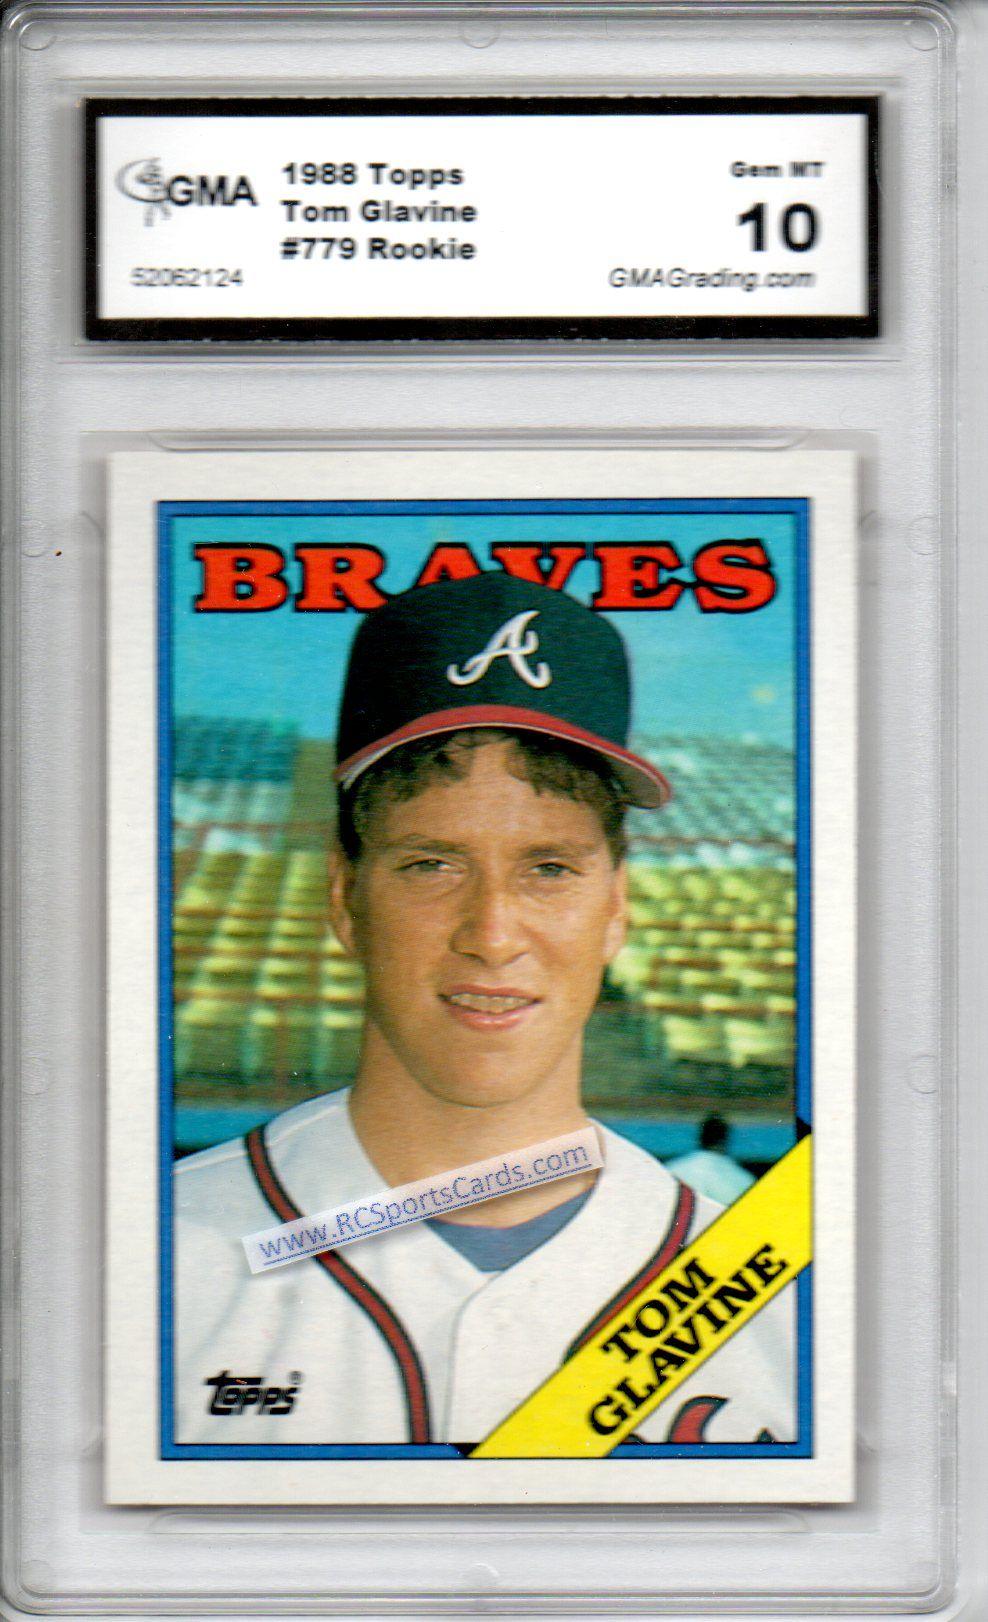 1988 topps baseball cards traded series